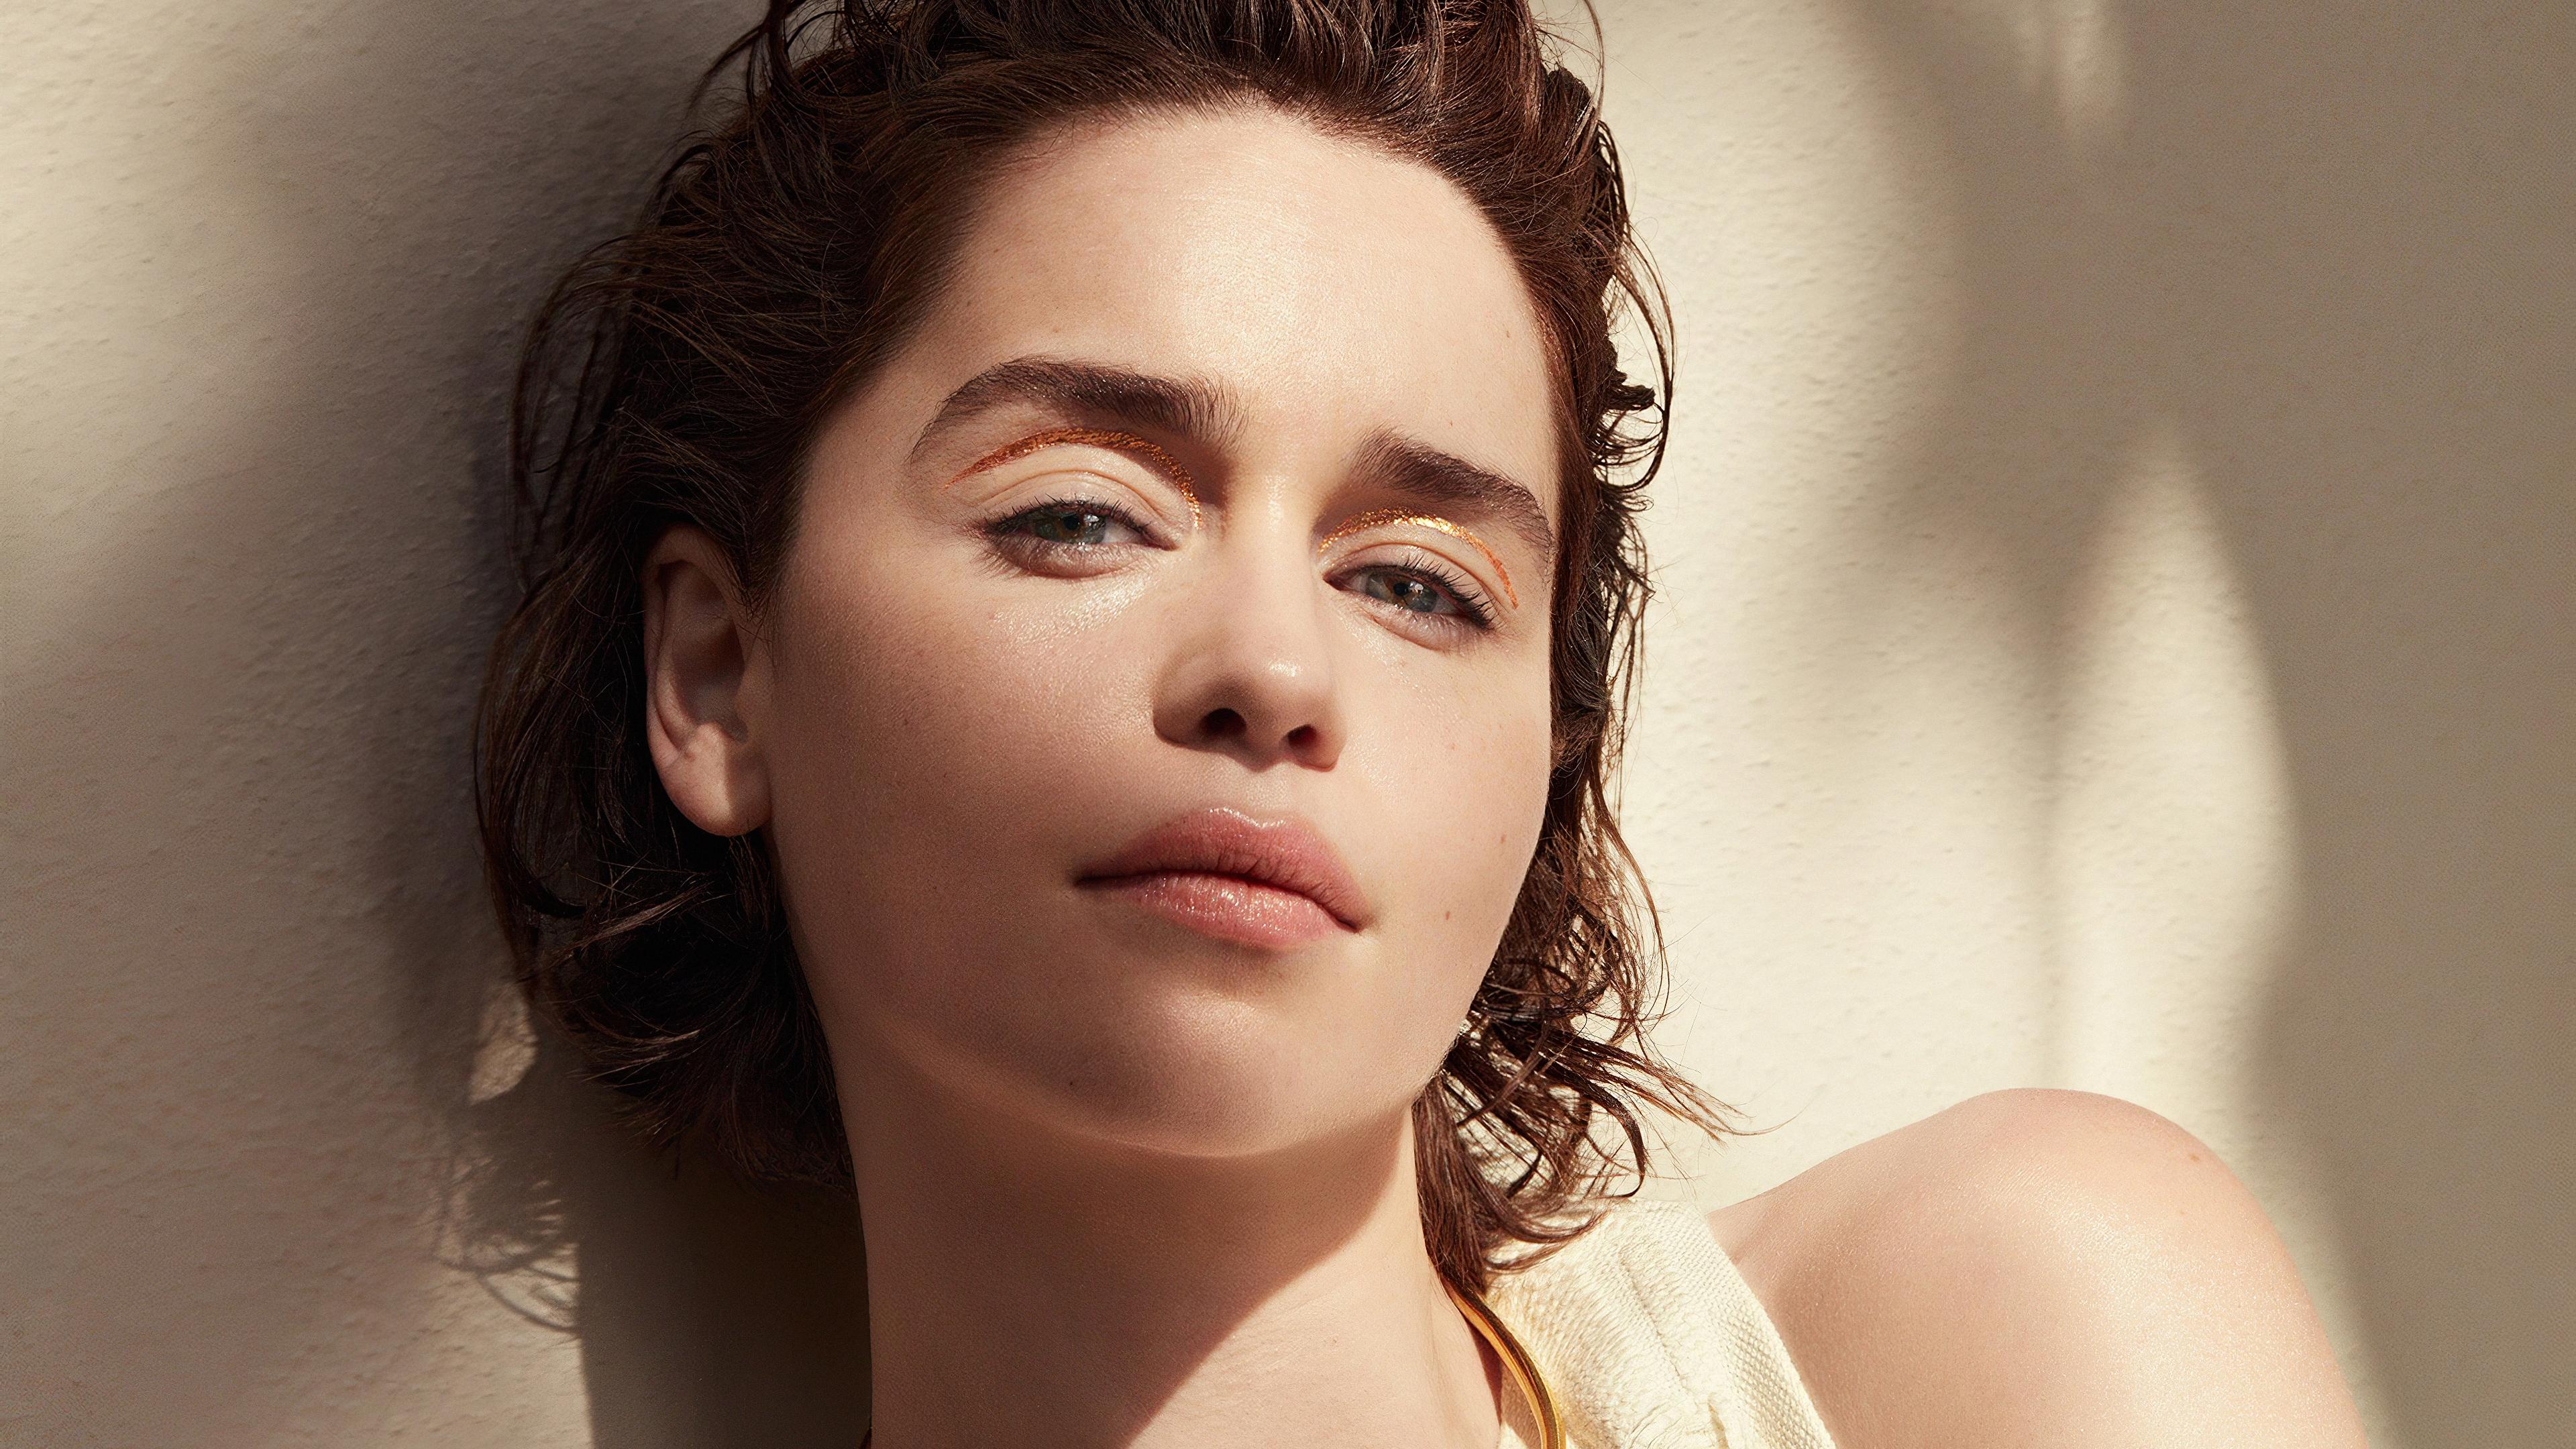 emilia clarke 2019 photoshoot 1574936753 - Emilia Clarke 2019 Photoshoot -